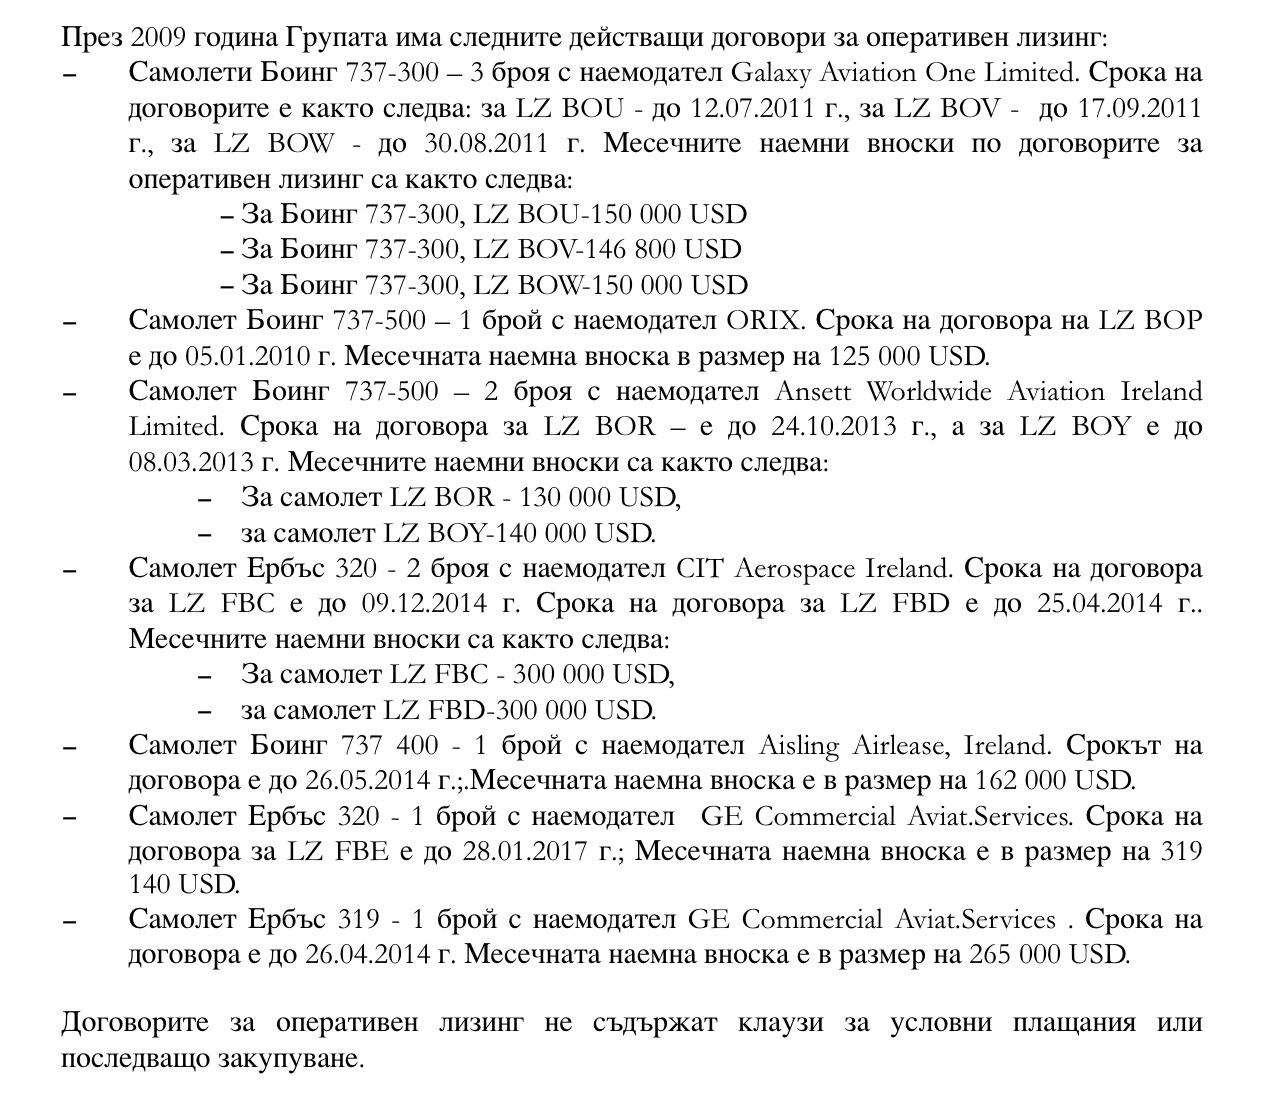 Capture_2013-11-21_a_18.41.53